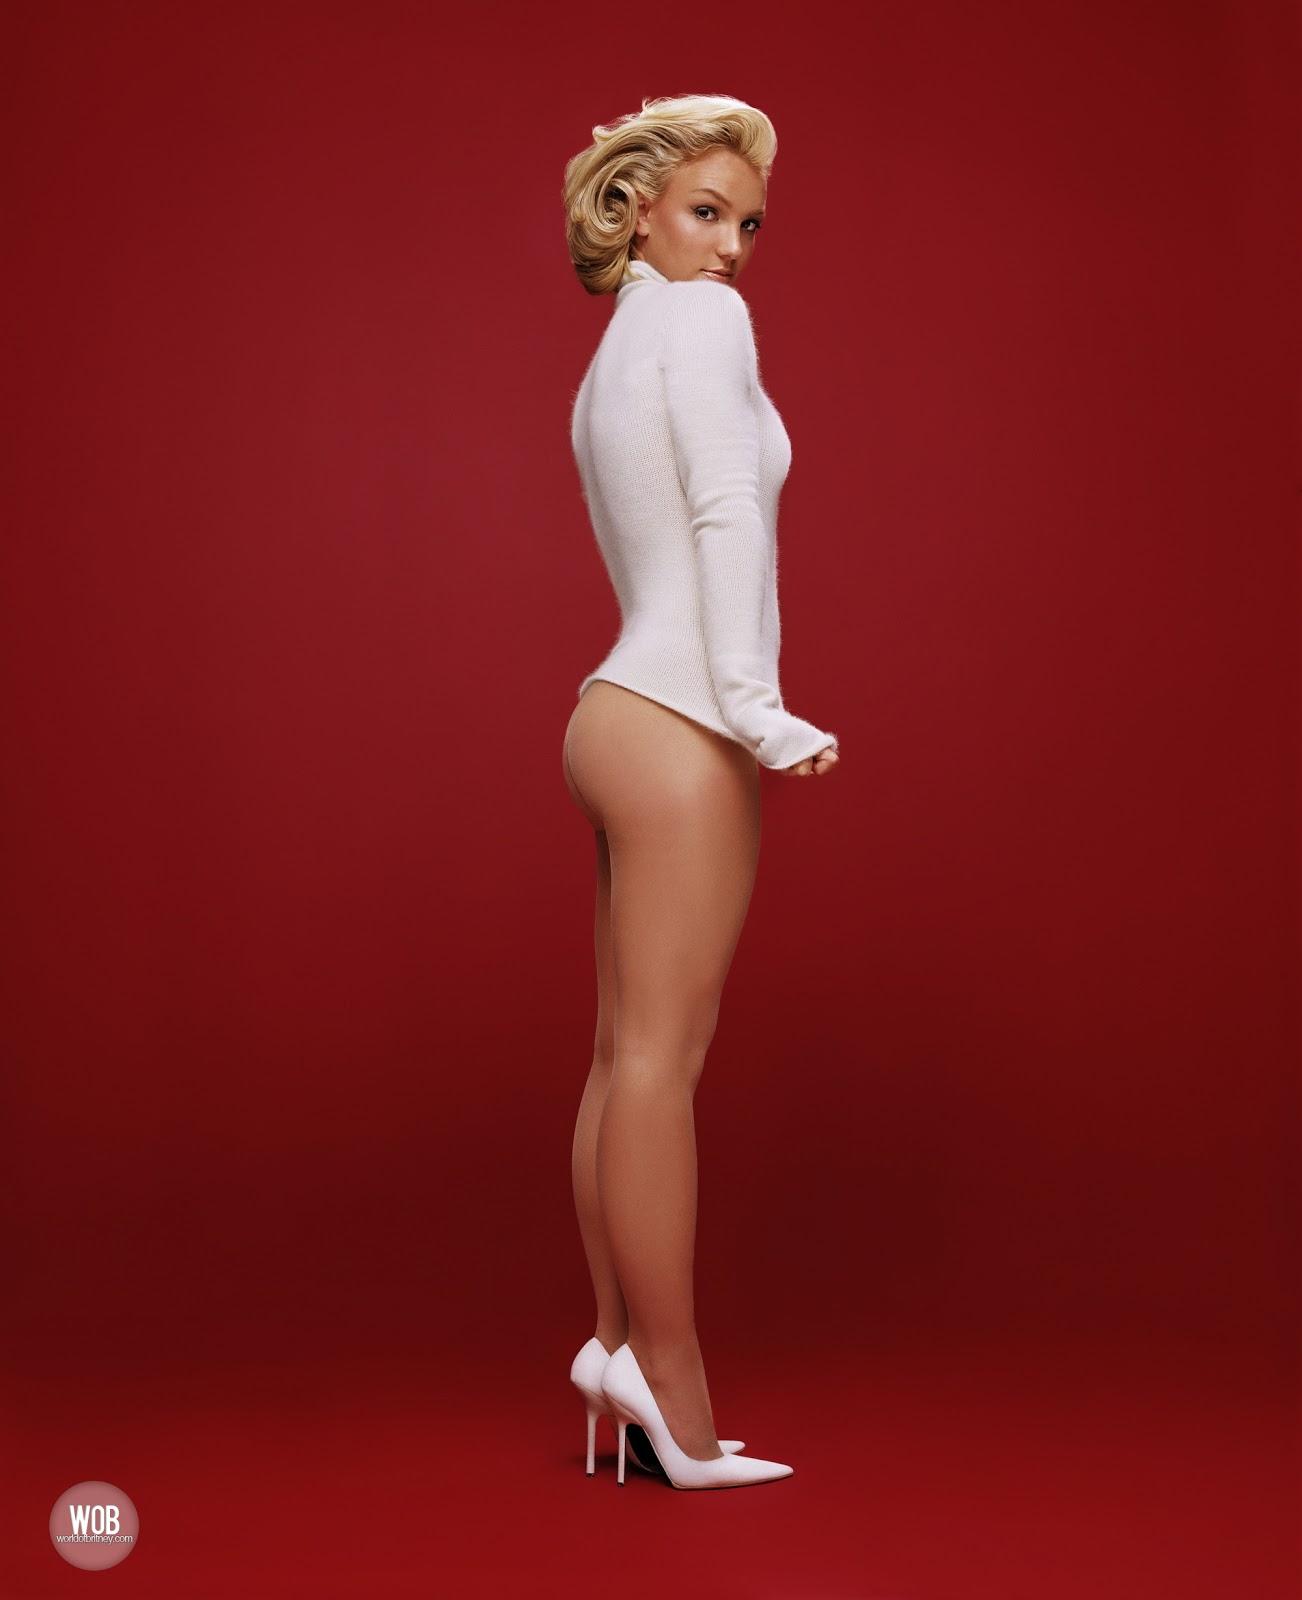 http://4.bp.blogspot.com/-6PeUx1VdG3k/UJRGeDA4K0I/AAAAAAAAQ6Y/--jdNaUYrI8/s1600/Sexy_Hot_Britney_Spears_colita.jpg